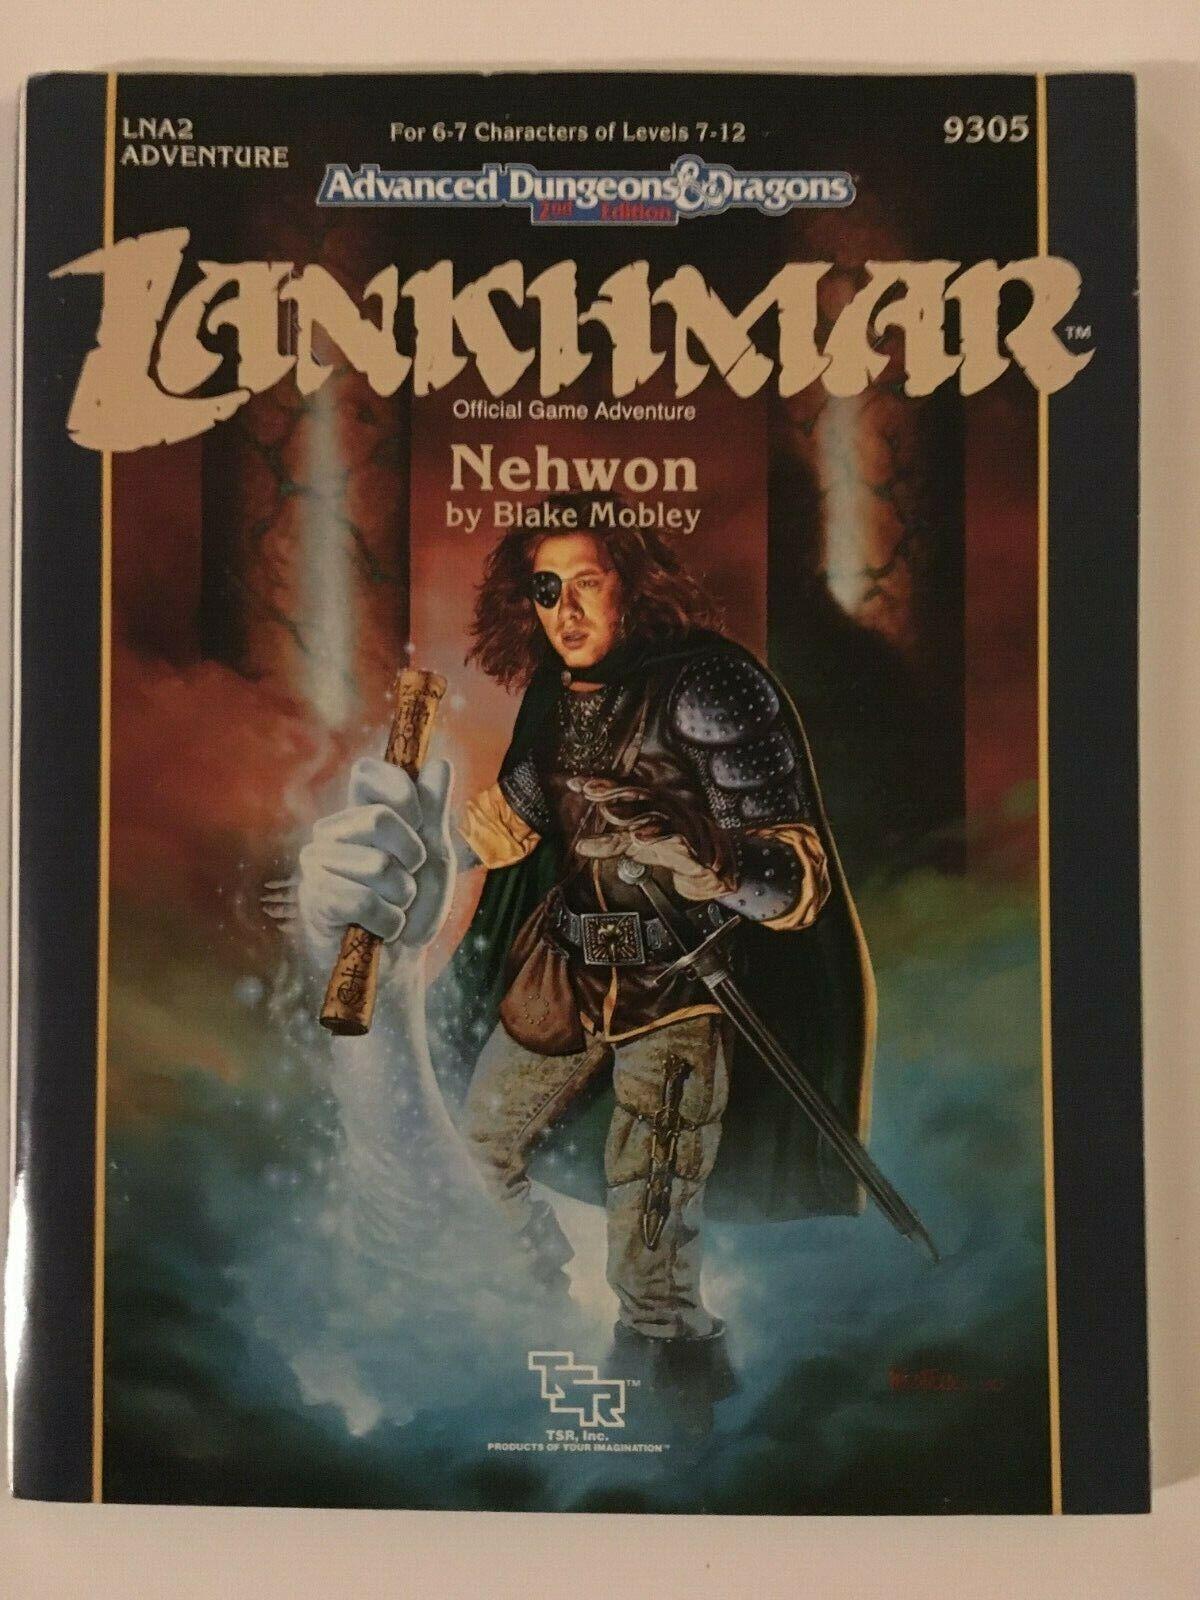 TSR Advanced Dungeons y dragones 2E T Lankhmar; Nehwon LNA2